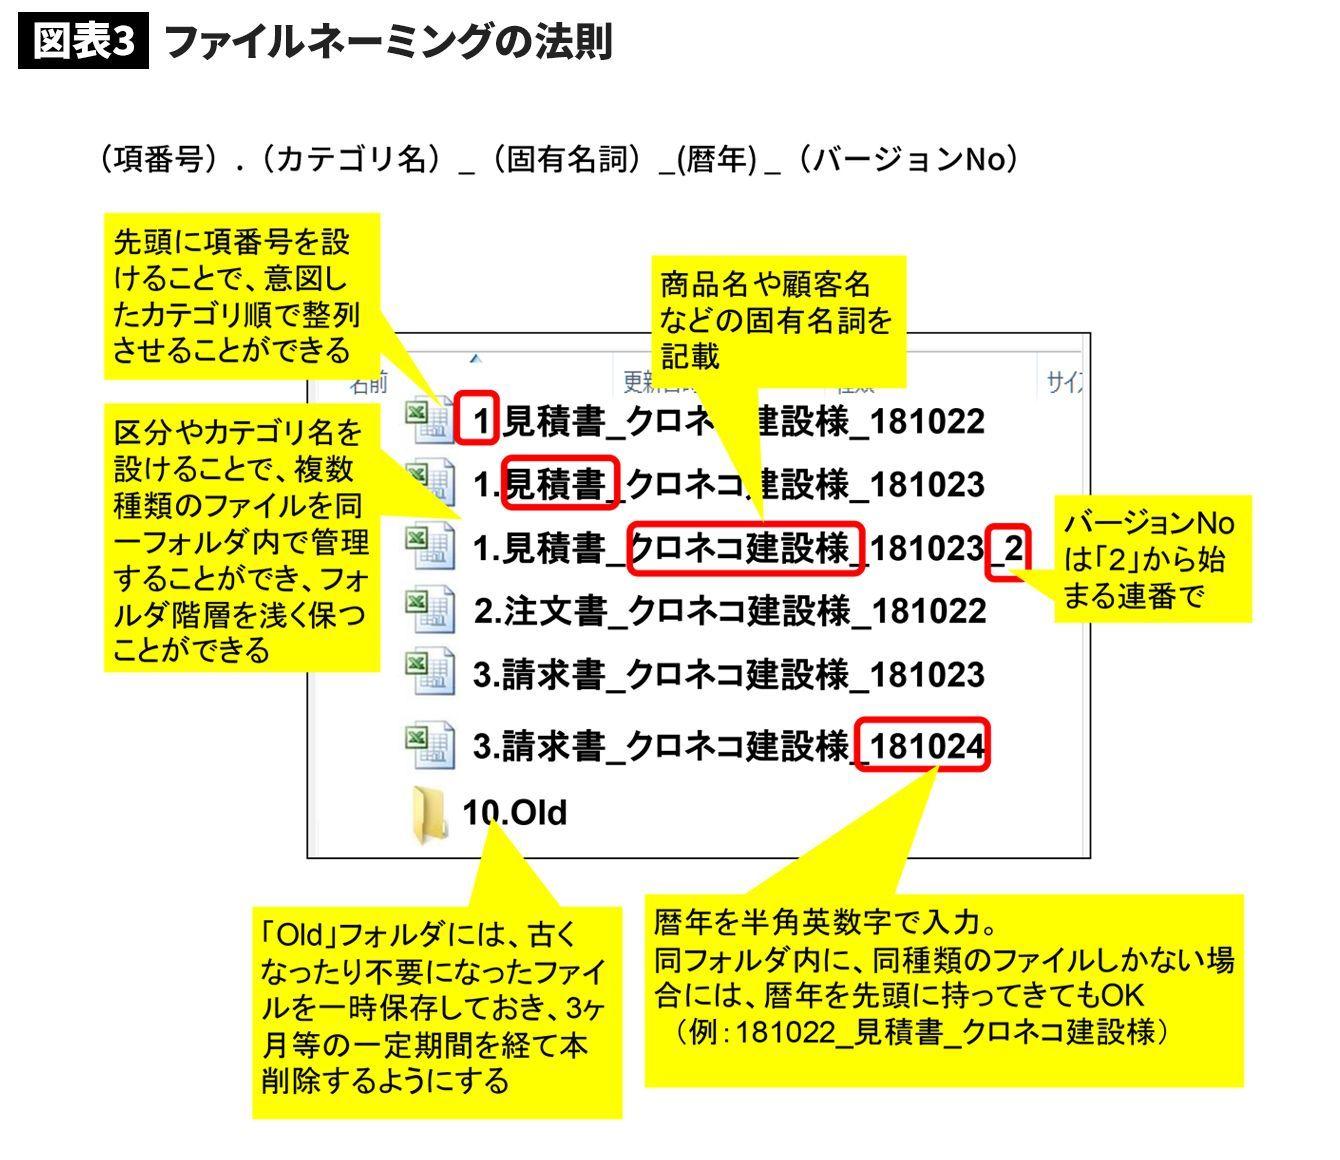 Pc上の探し物をなくす フォルダ整理術4つ フォルダ 整理 家系図